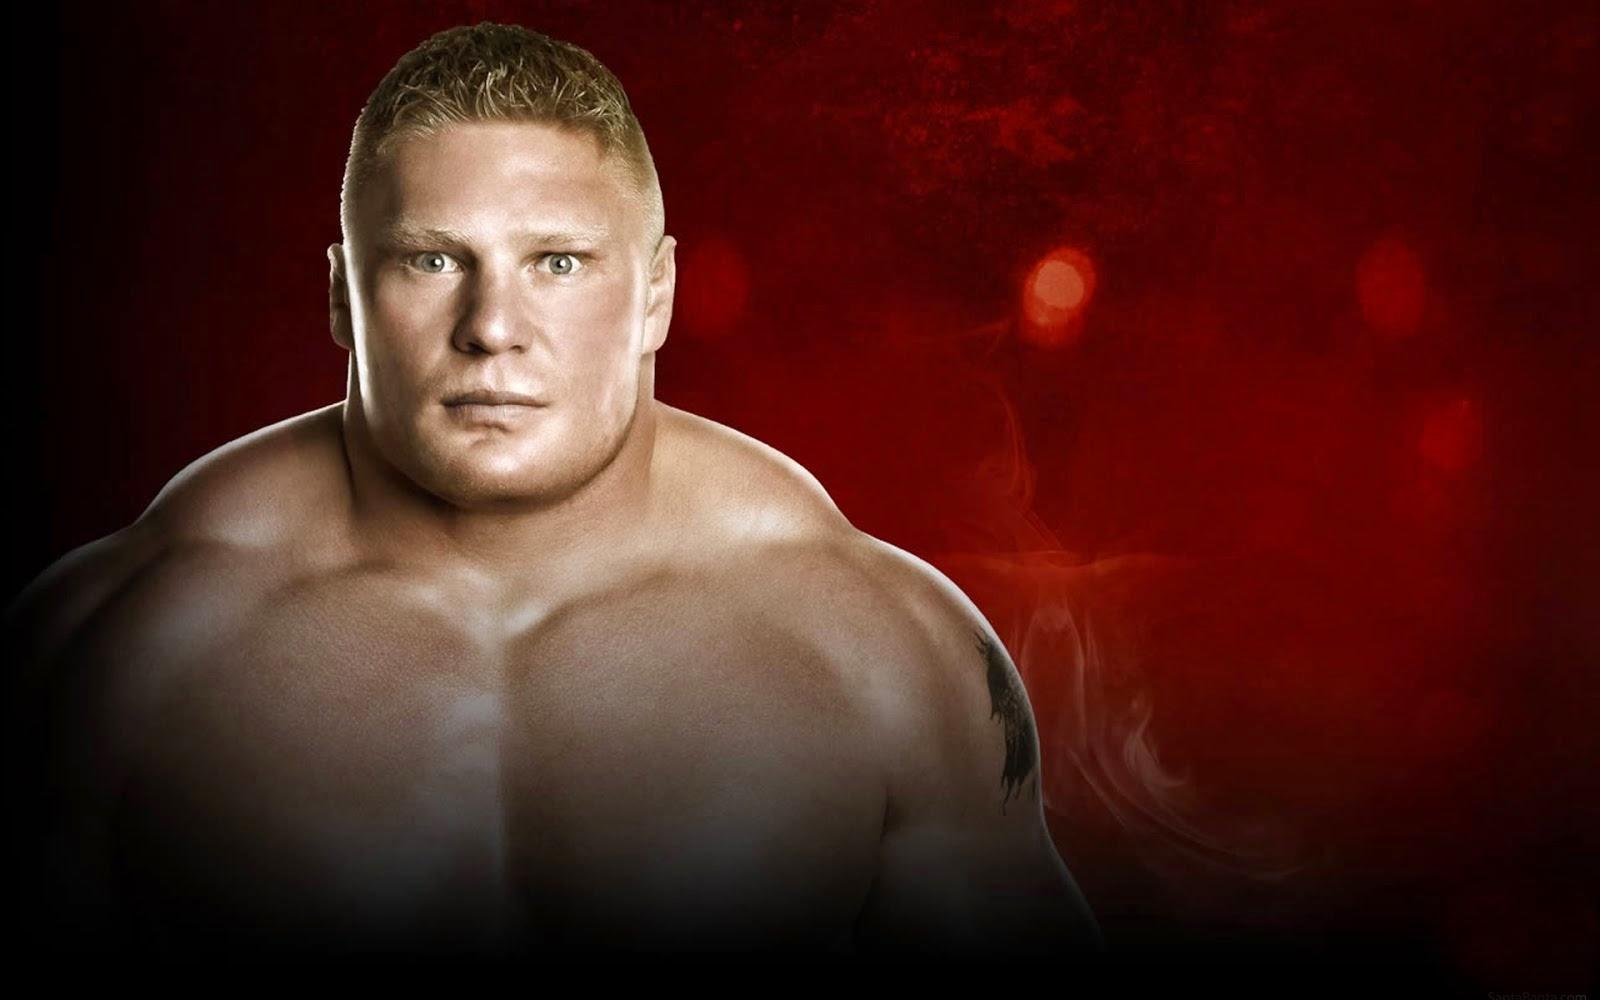 Brock Lesnar HD Wallpapers - WWE Wrestler   HD Wallpapers ...